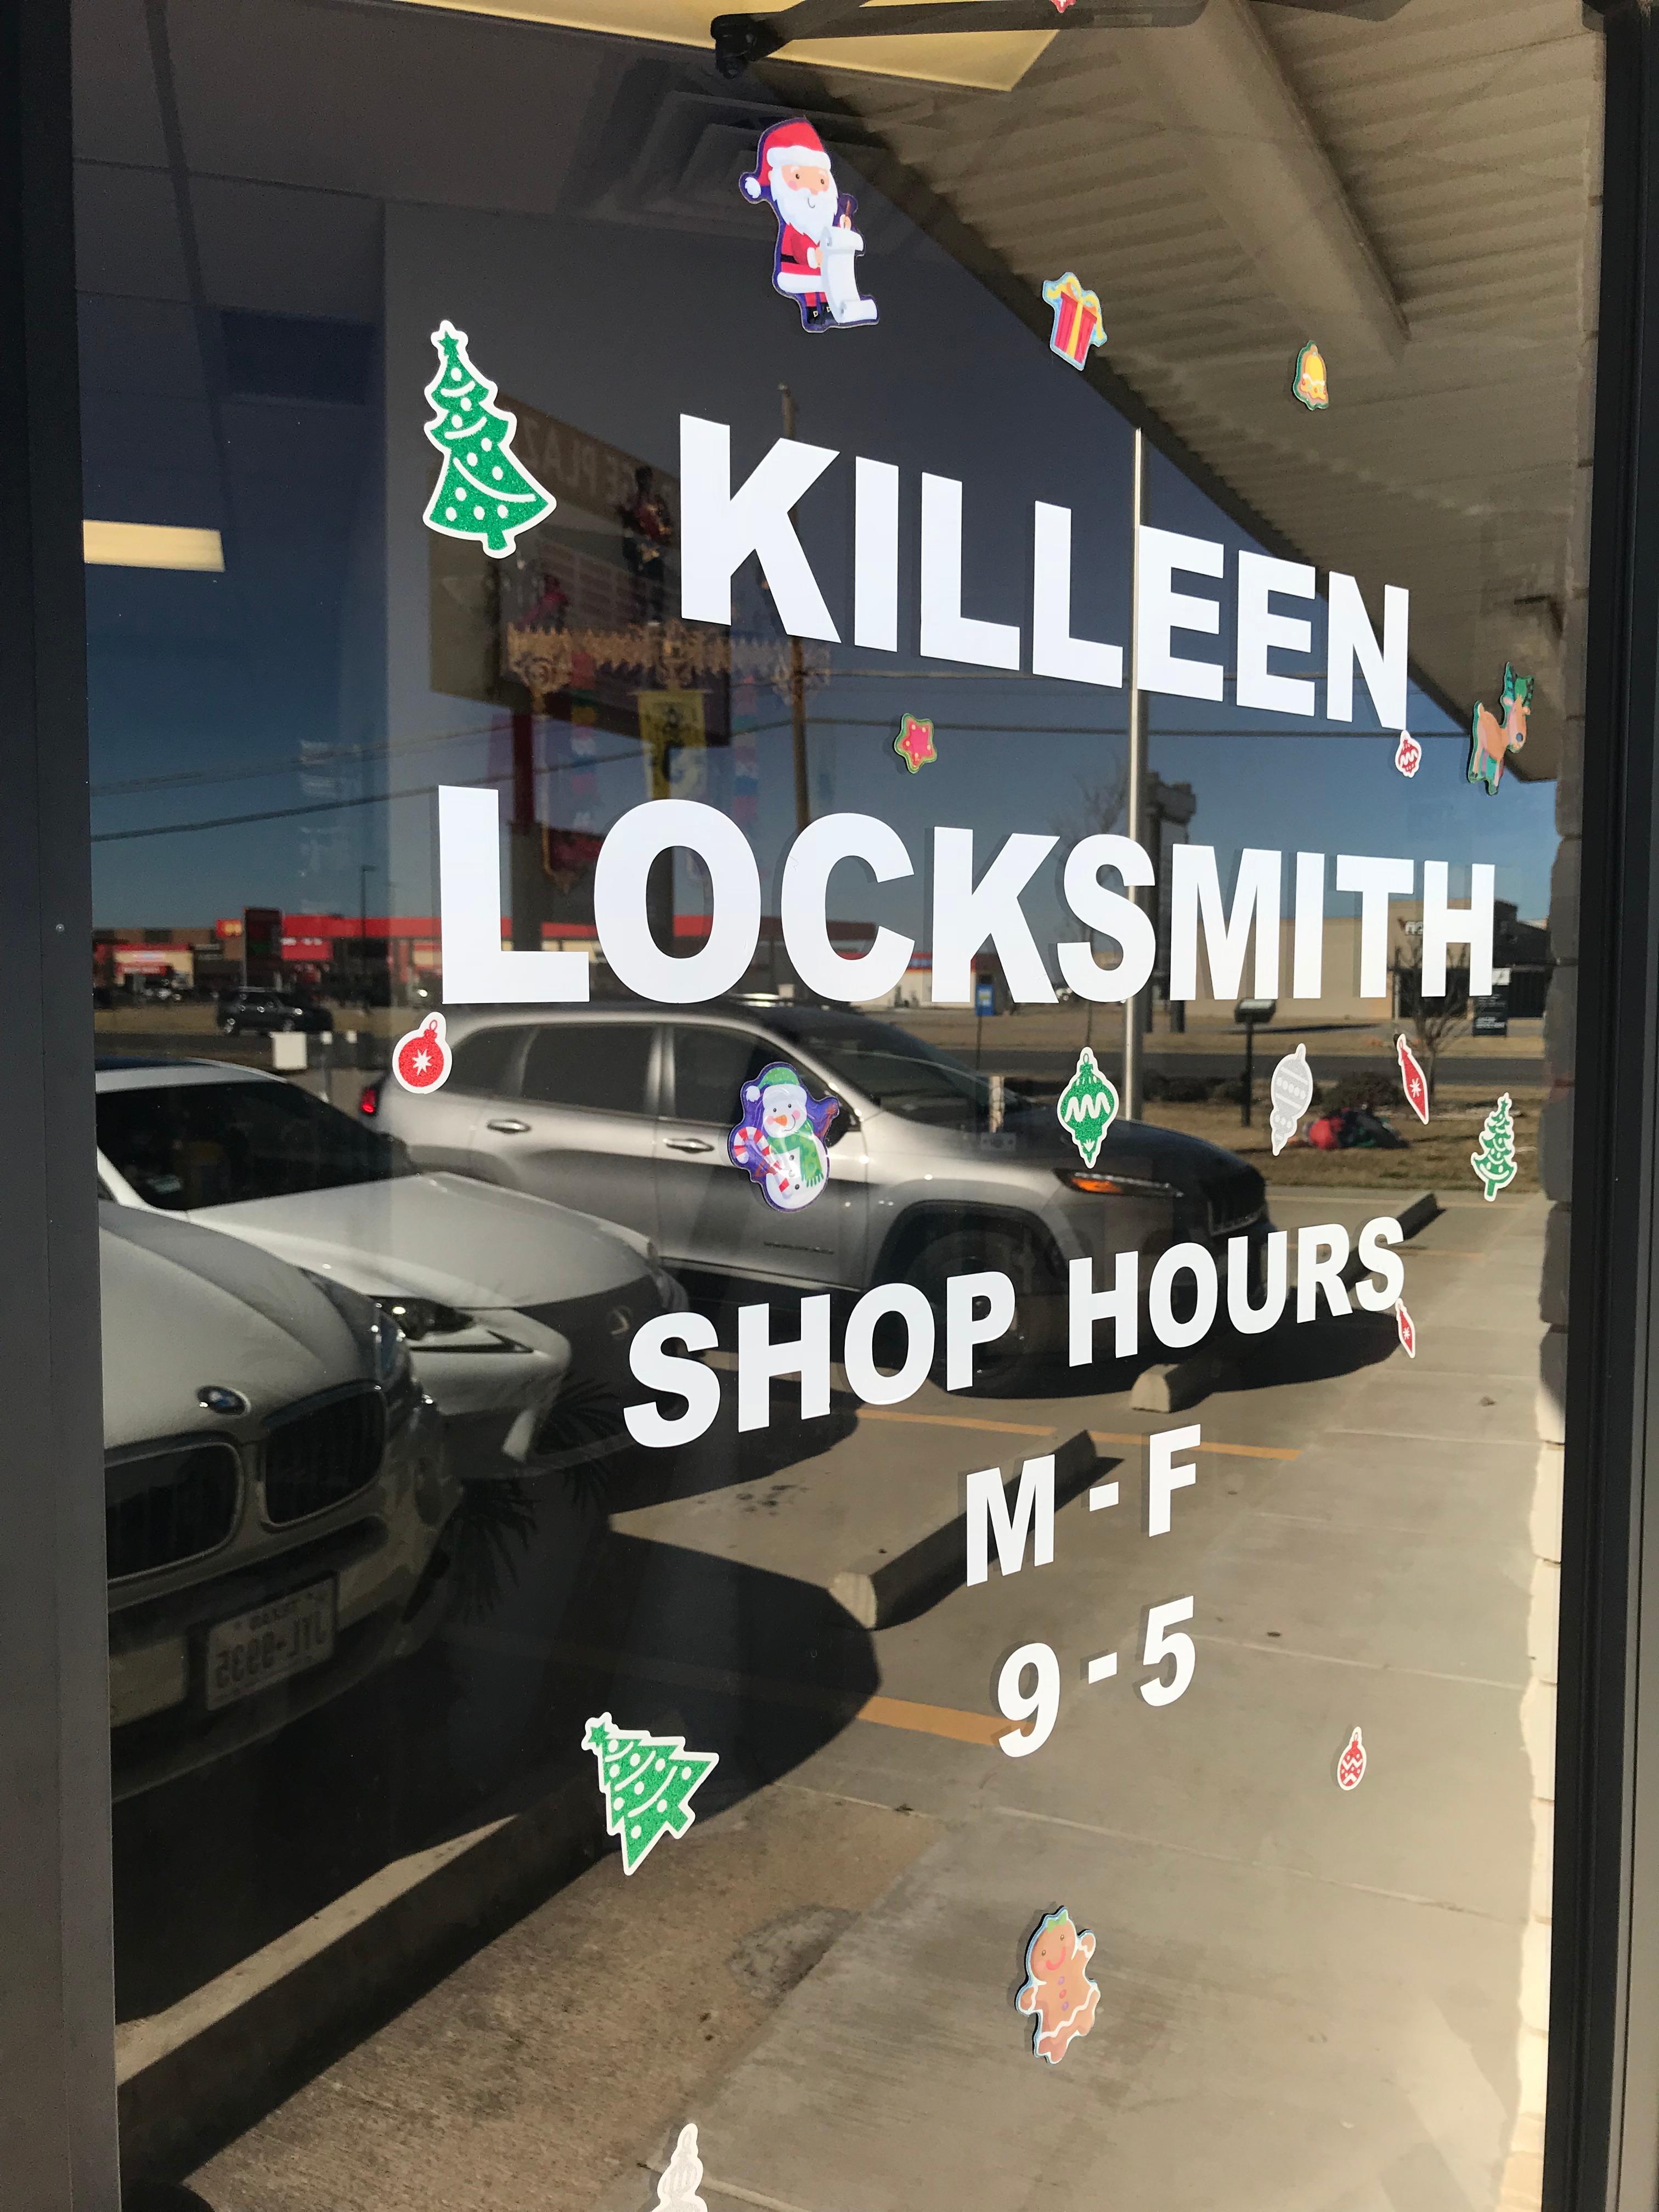 Killeen Locksmith image 3